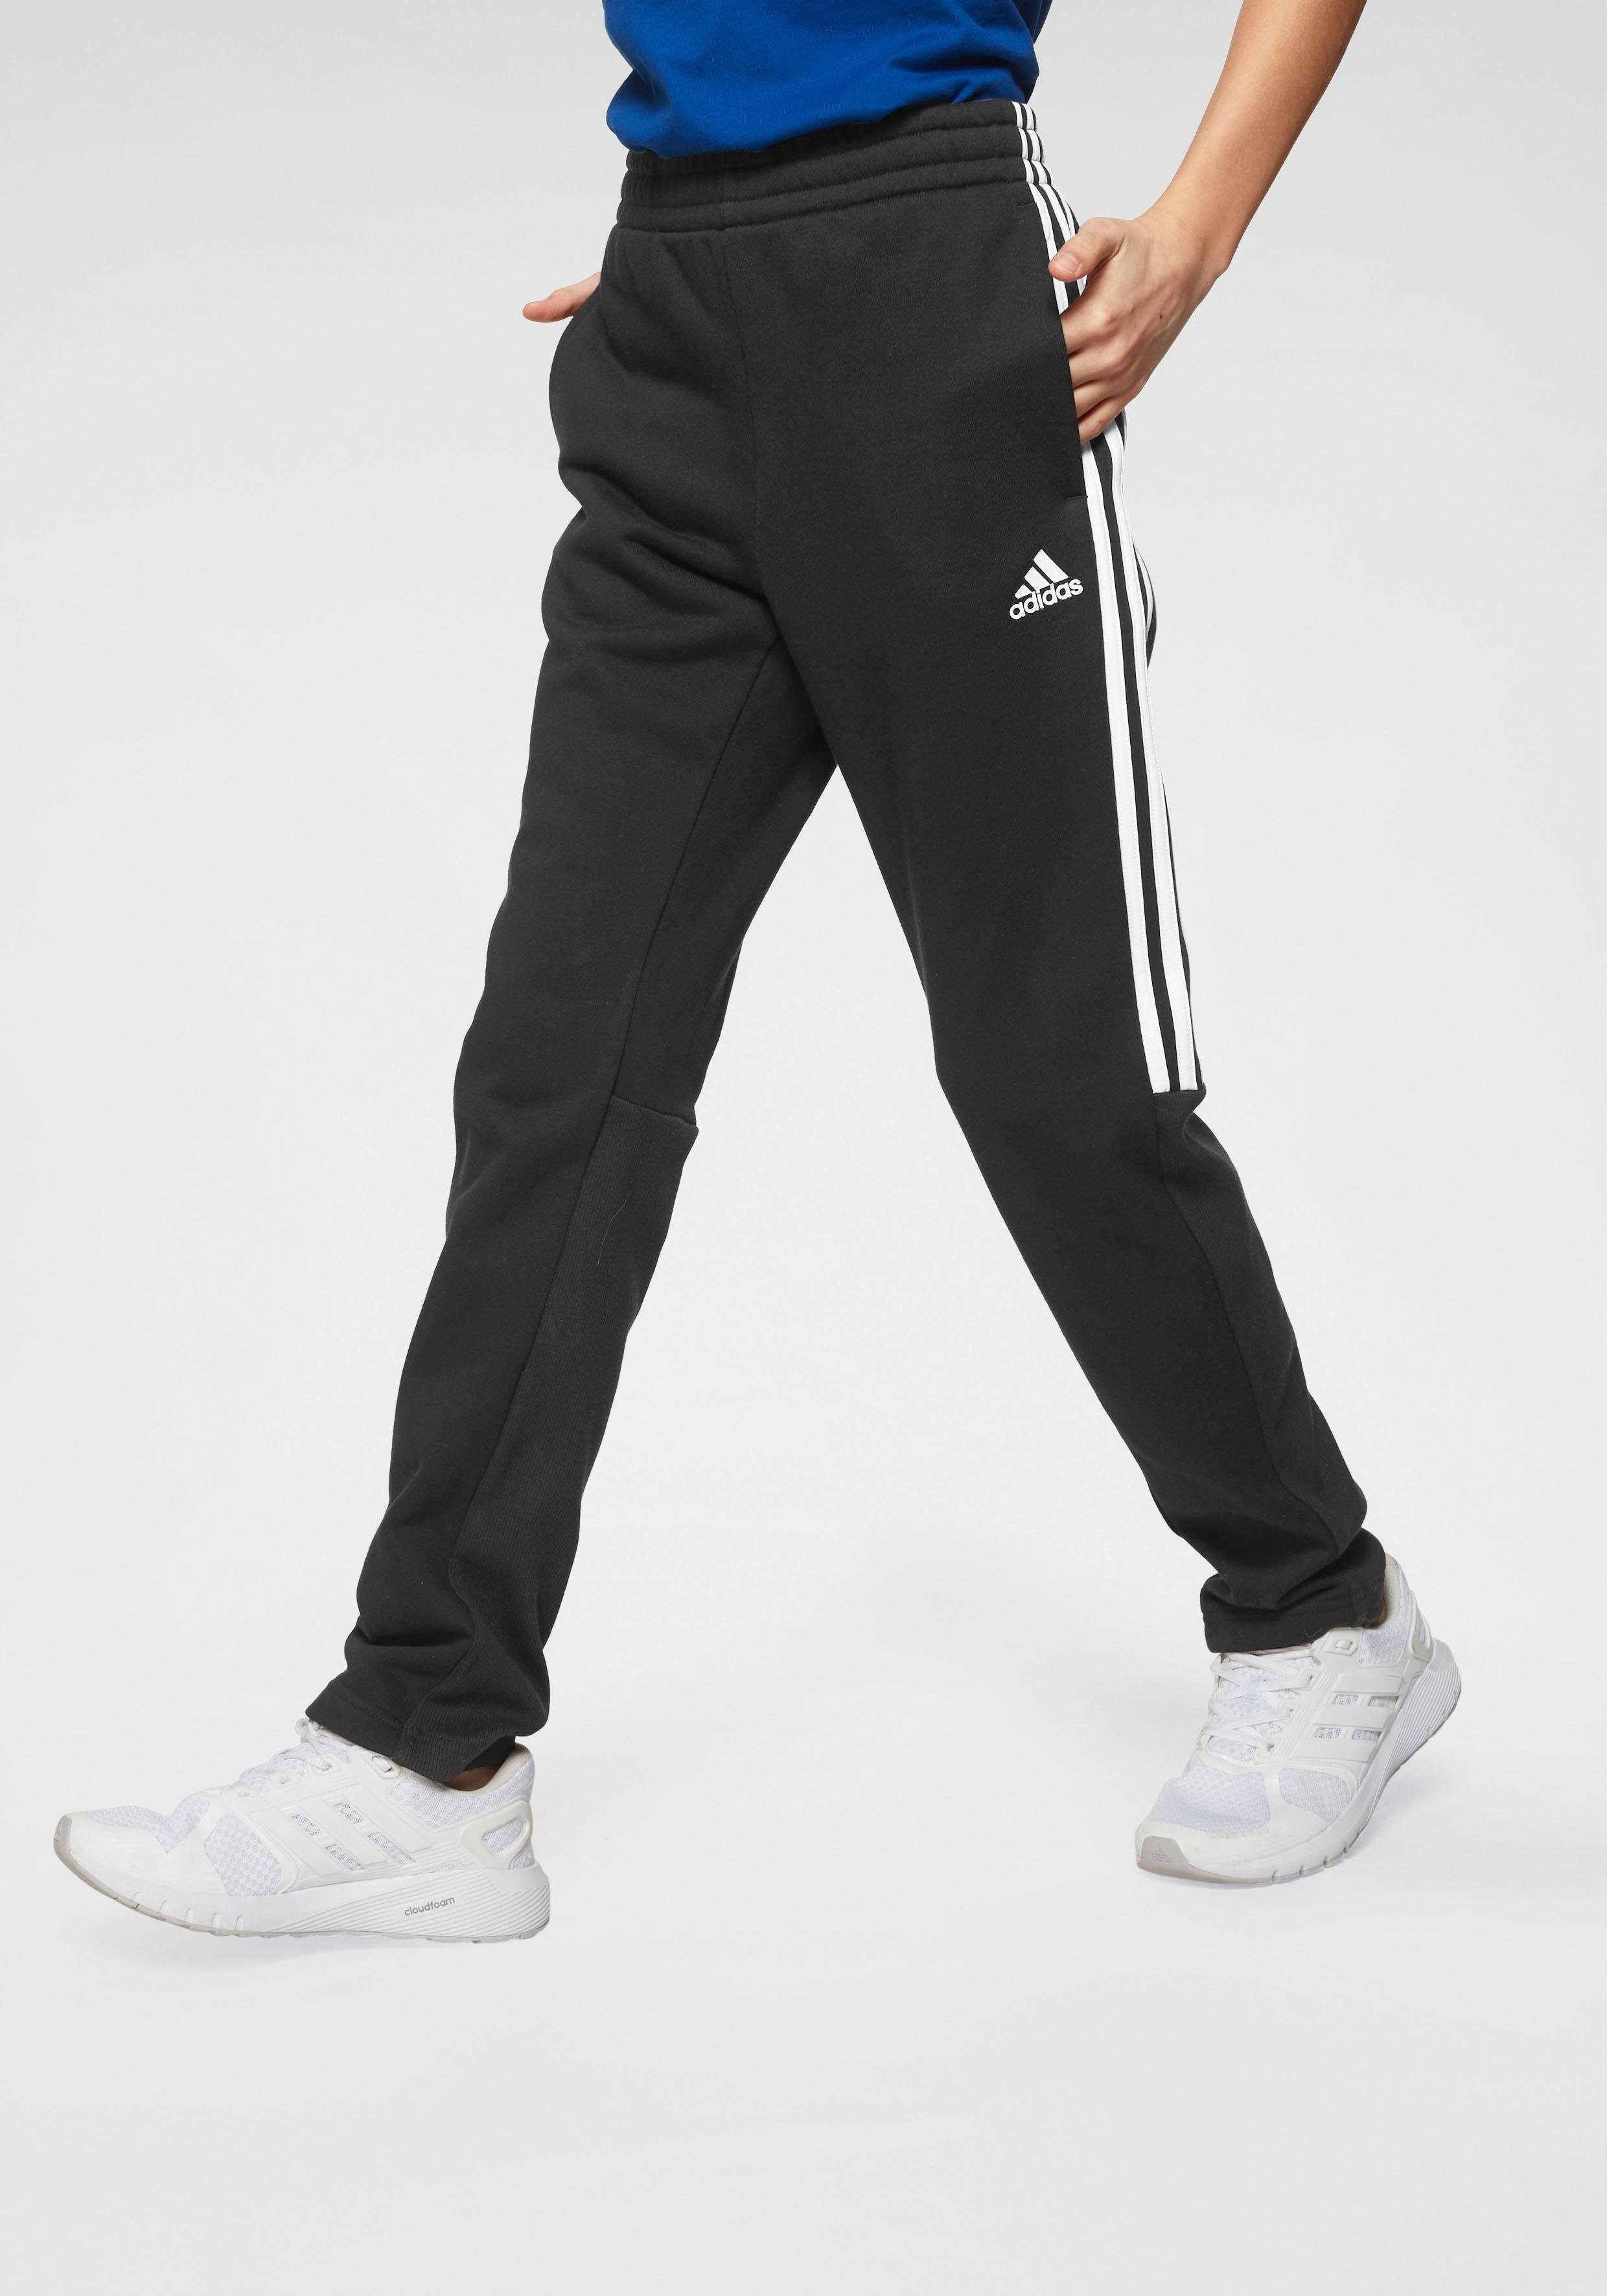 adidas Performance Jogginghose »YOUTH BOYS MUST HAVES 3 STRIPES TIRO PANT« online kaufen | OTTO